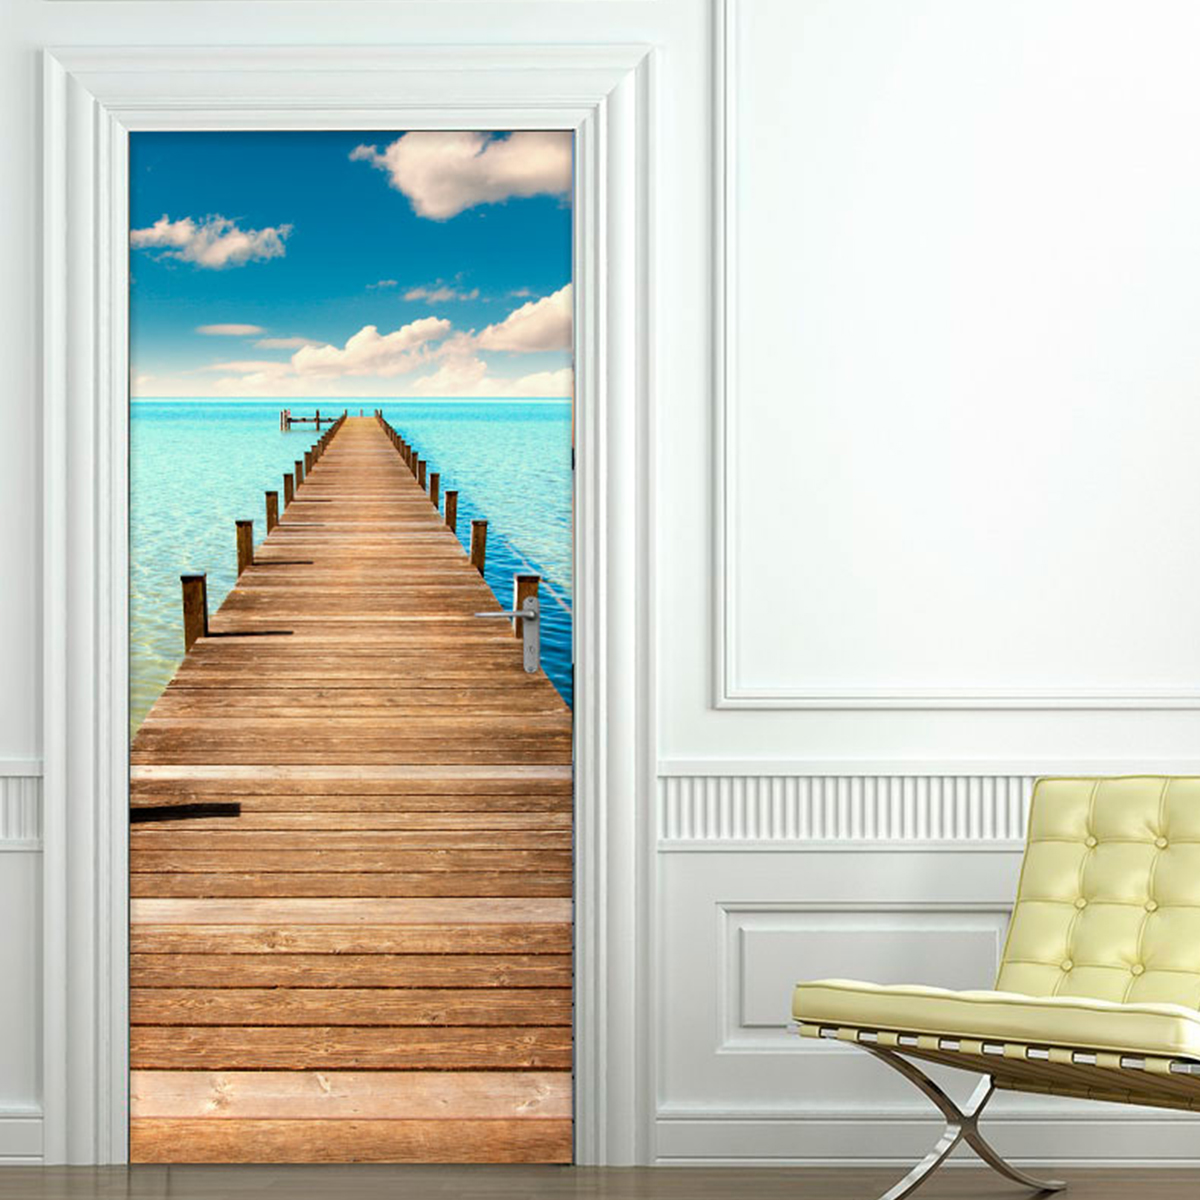 sticker porte long ponton sur la plage stickers. Black Bedroom Furniture Sets. Home Design Ideas